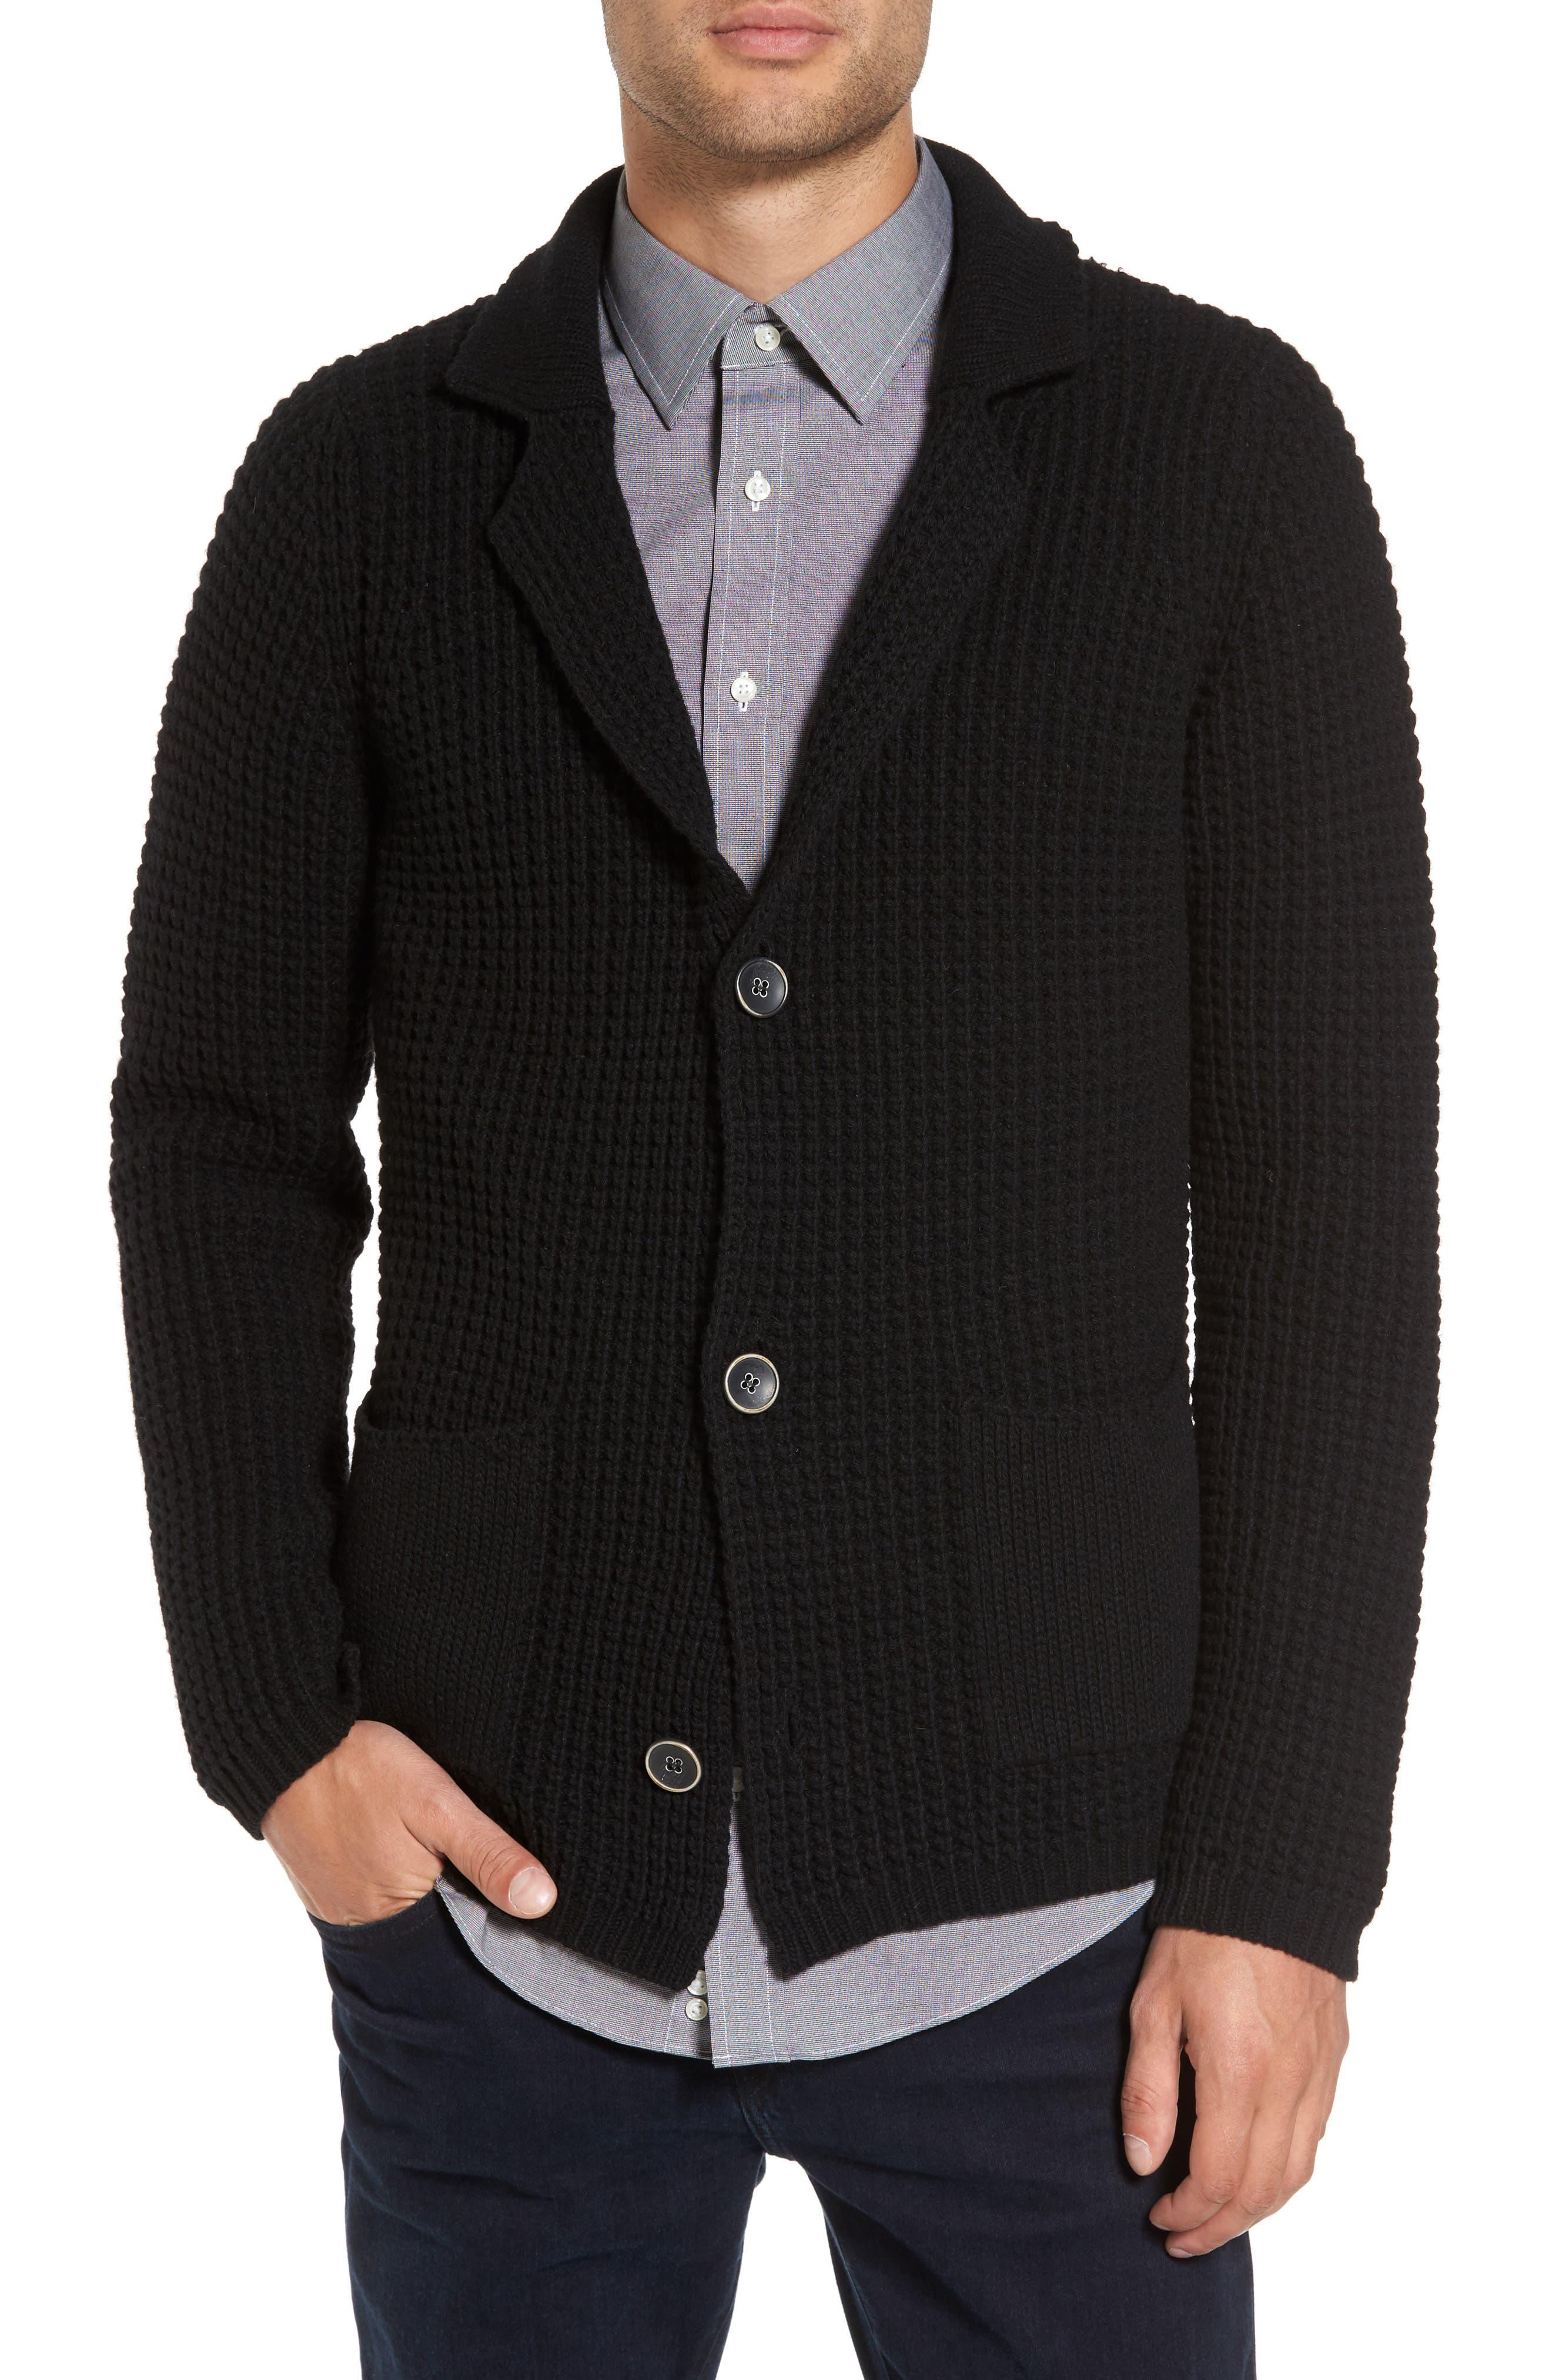 Sand Trim Fit Knit Cardigan Jacket